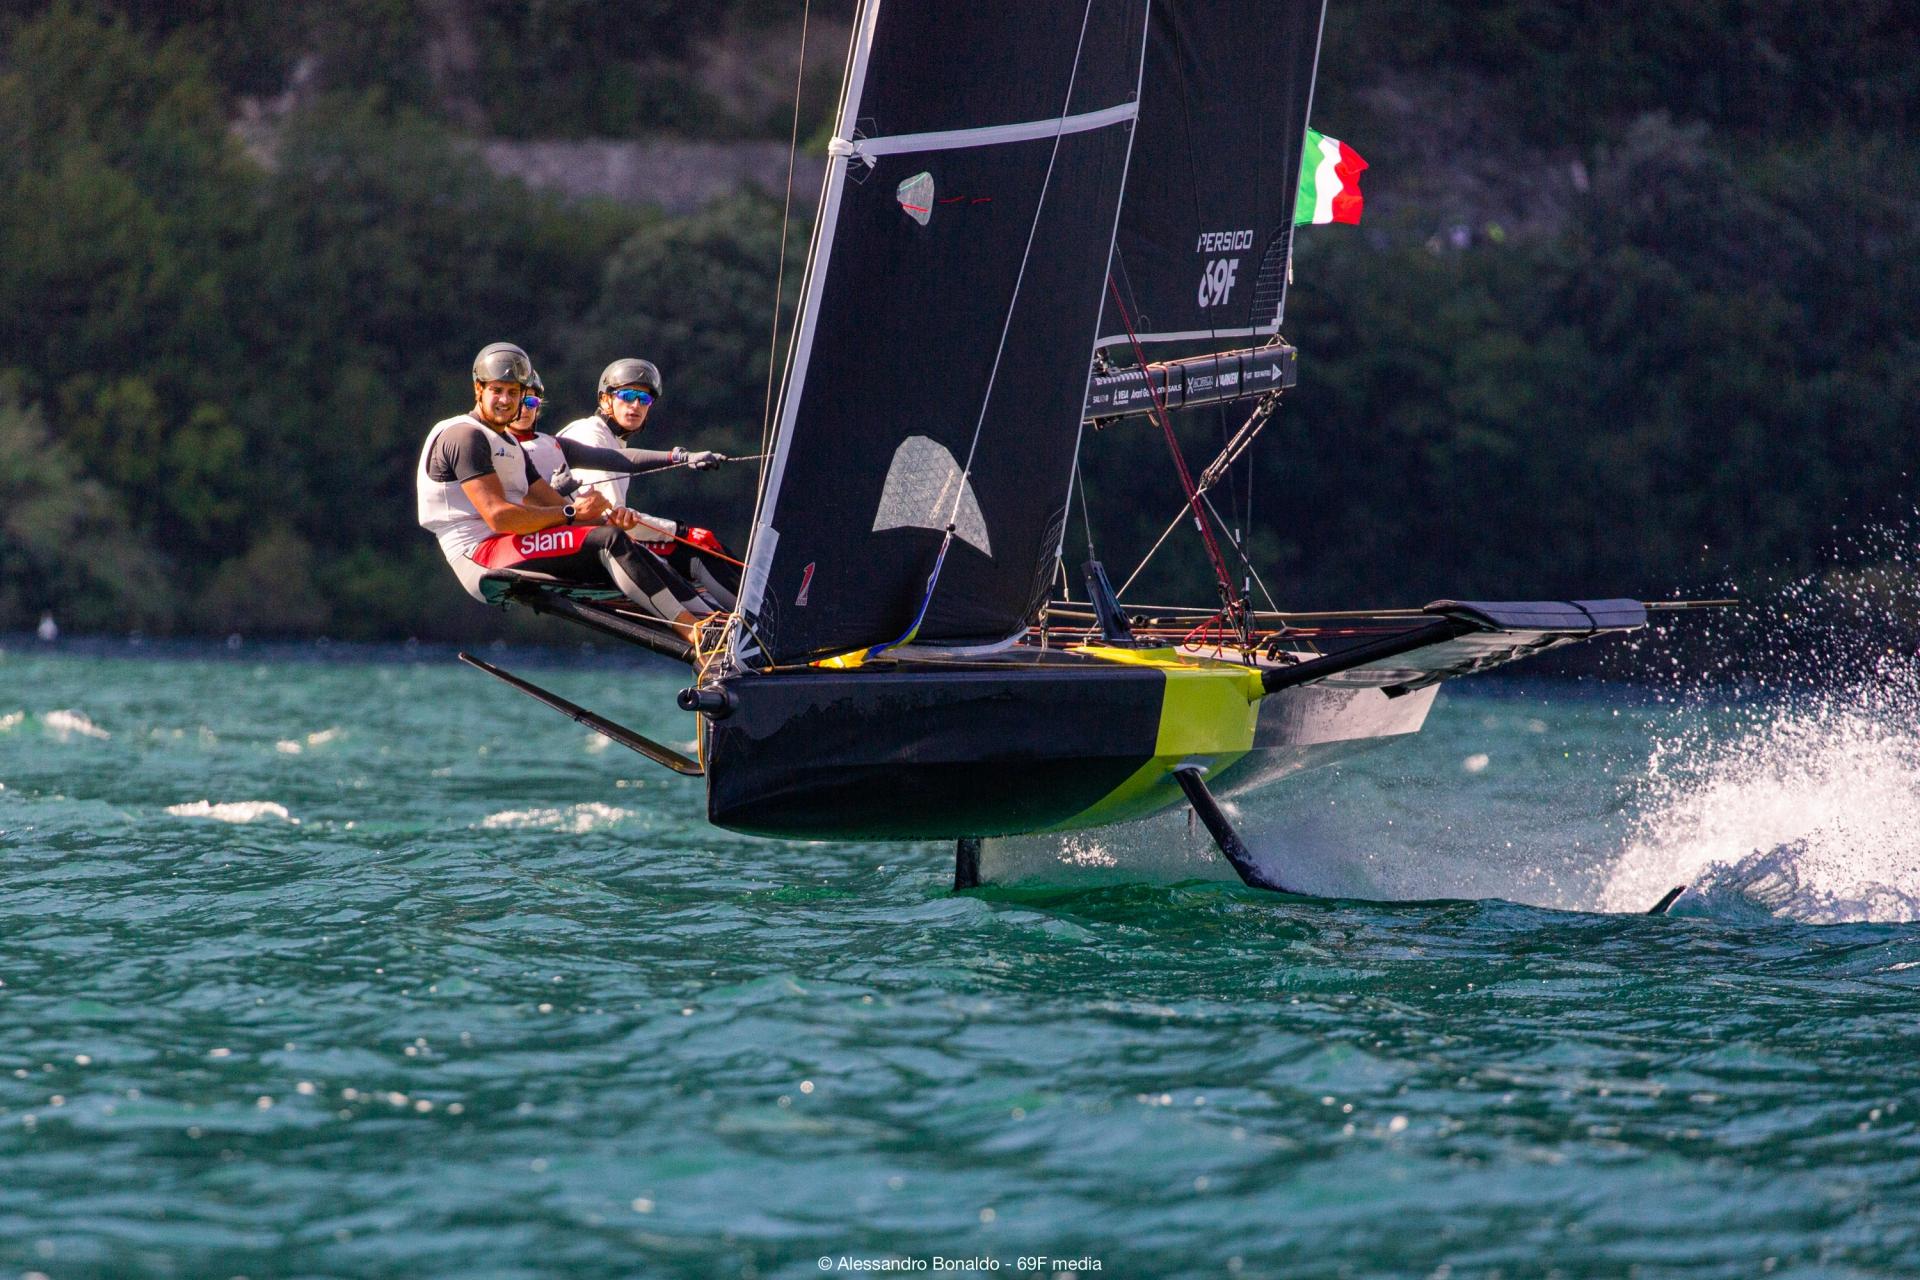 Youth Foiling Gold Cup: Young Azzurra conclude le qualifiche al terzo posto - MEMBER NEWS - Yacht Club Costa Smeralda